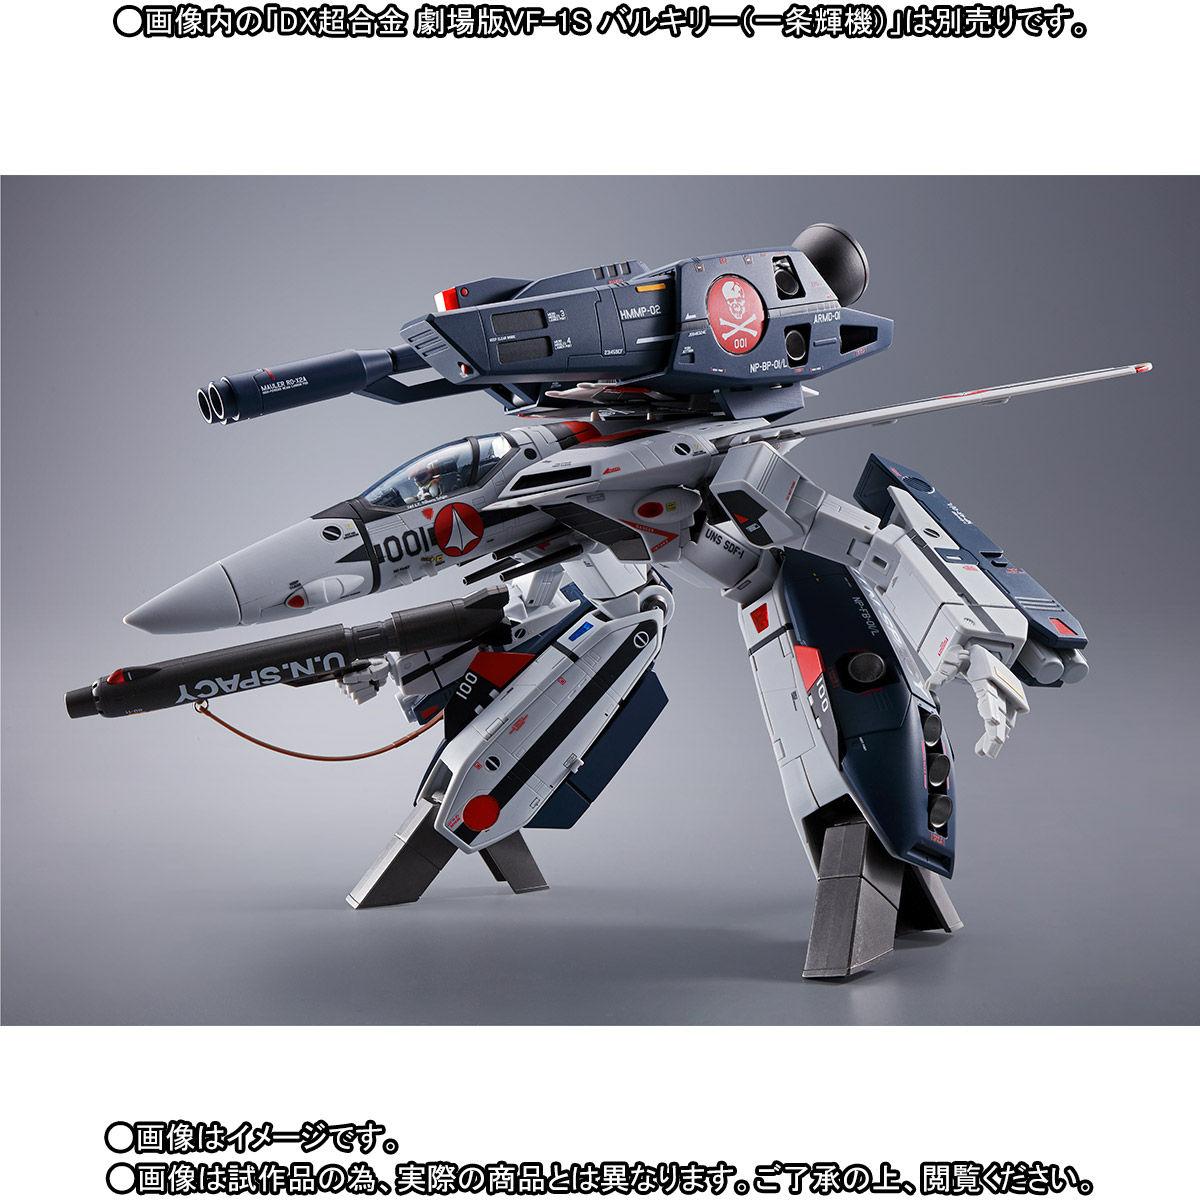 DX超合金『劇場版VF-1対応ストライク/スーパーパーツセット』拡張パーツ-008